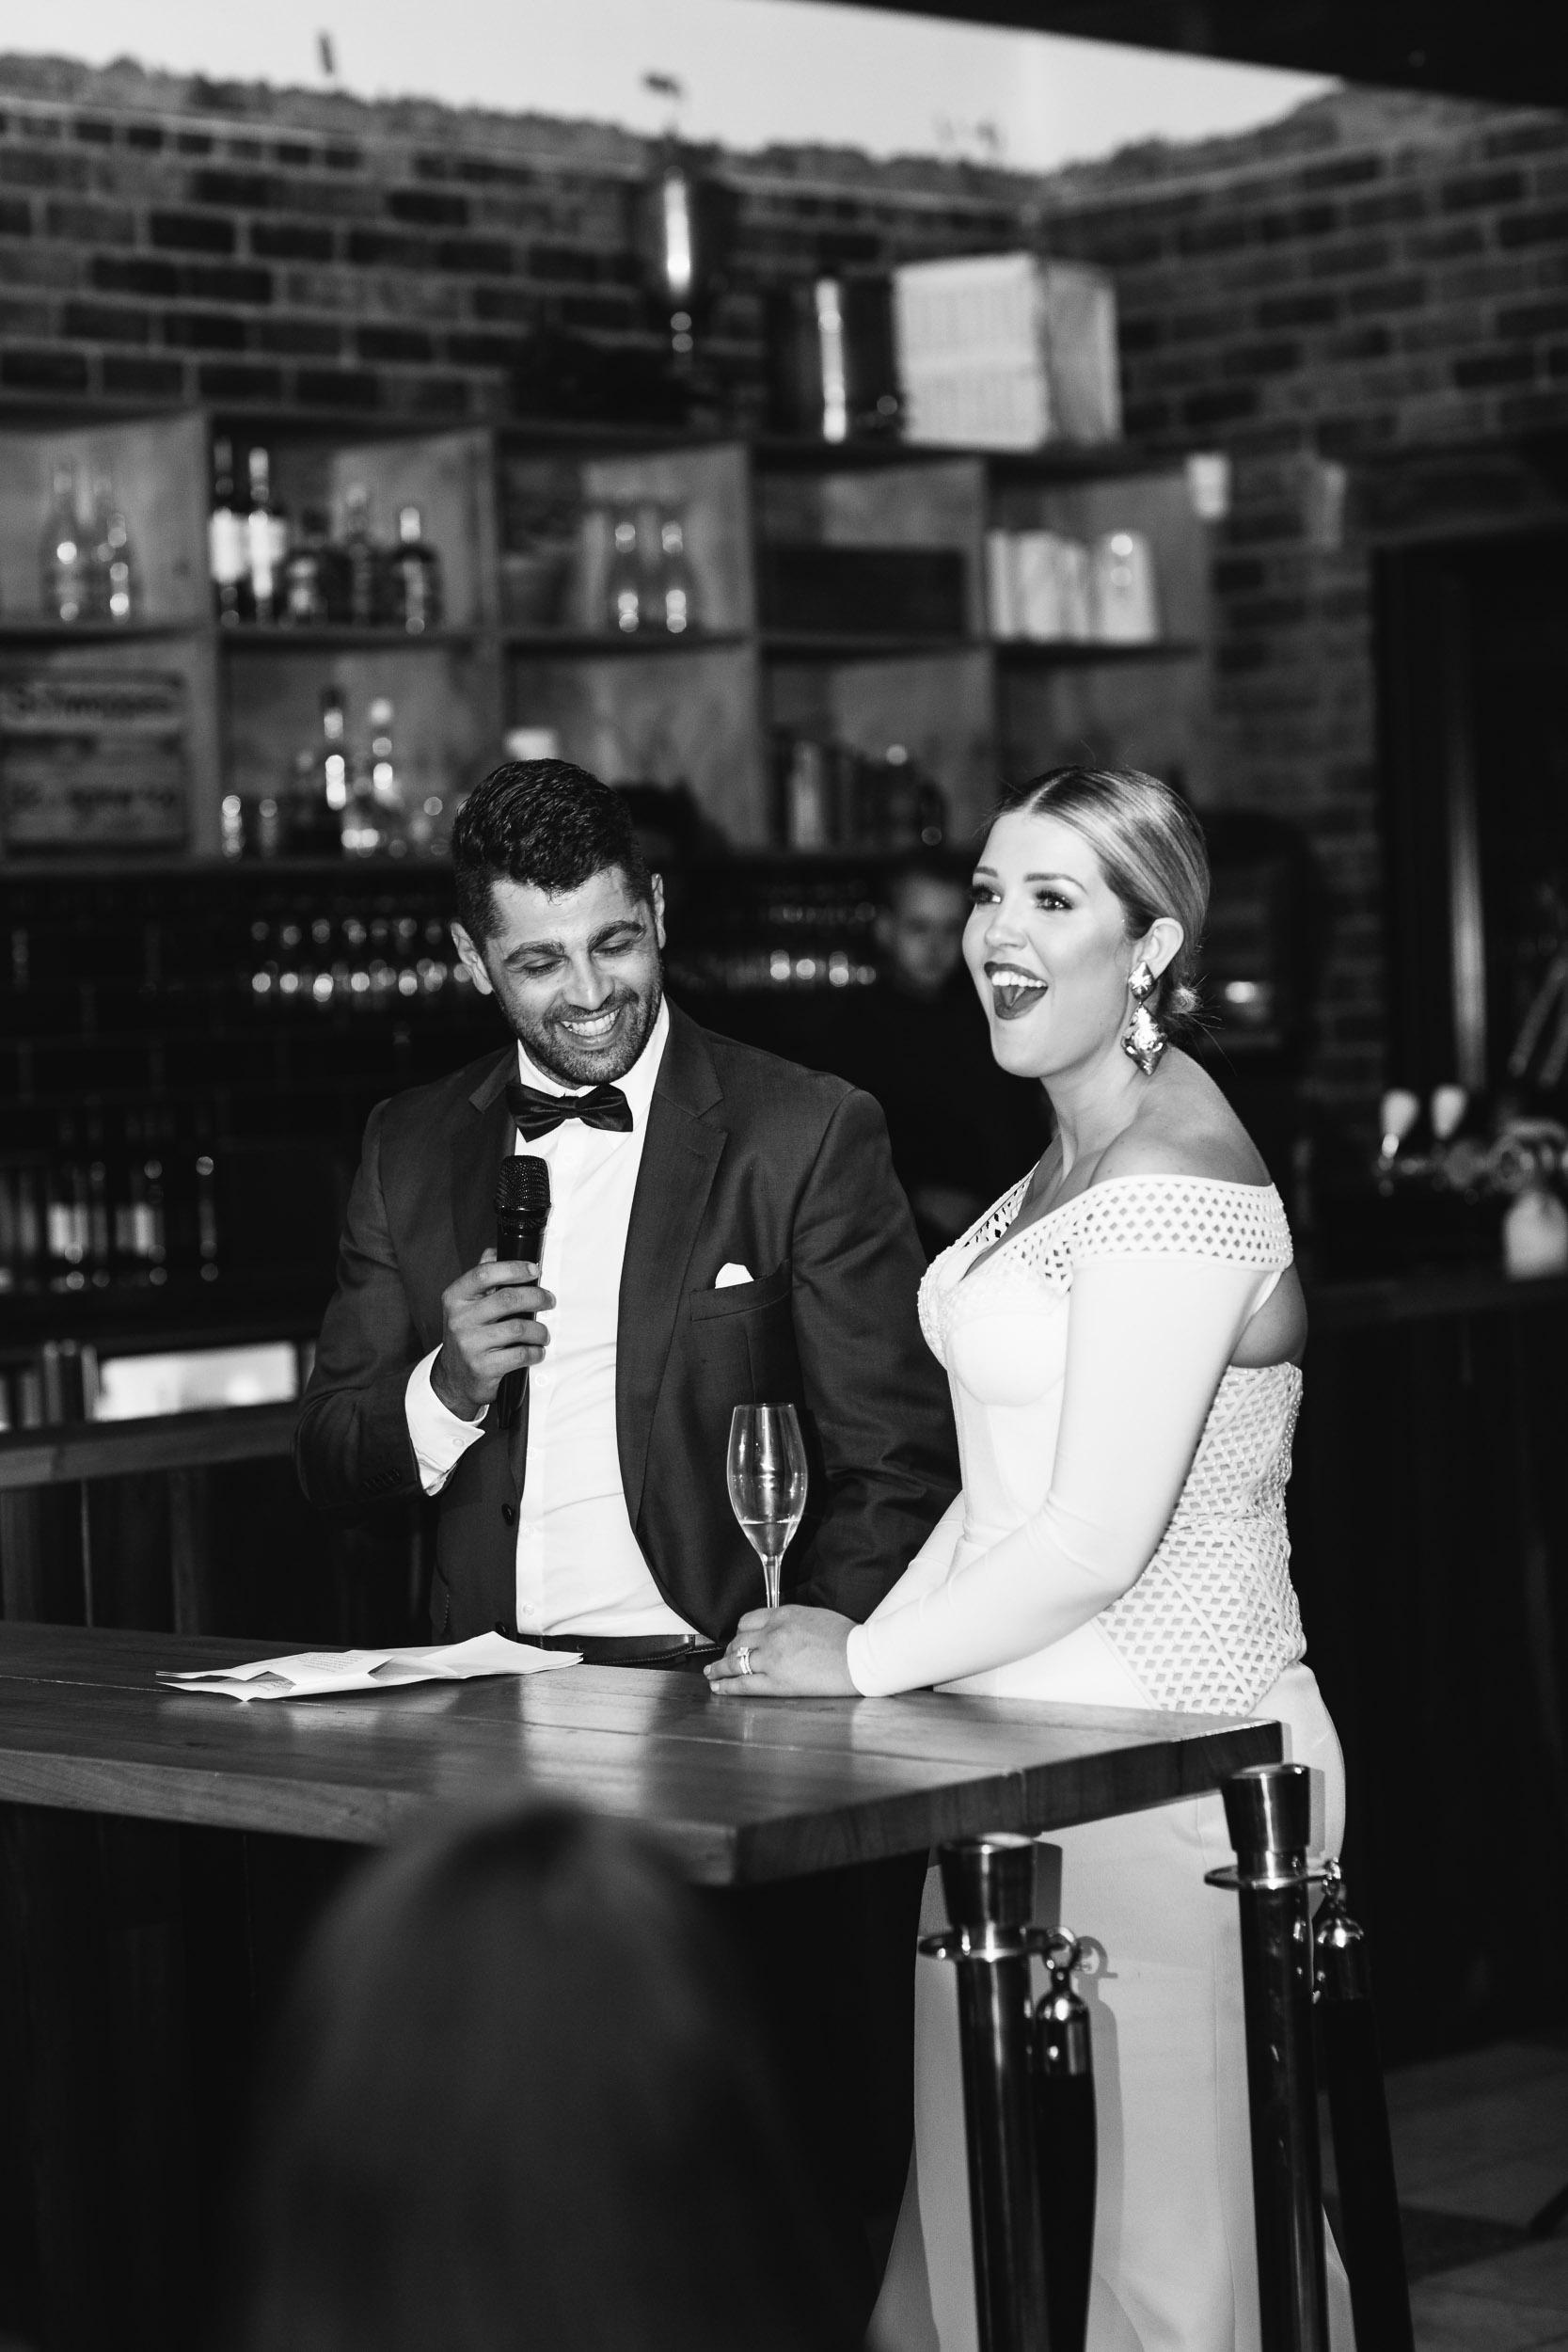 Kas-Richards-Urban-Melbourne-Wedding-Jason-Grech-770.jpg